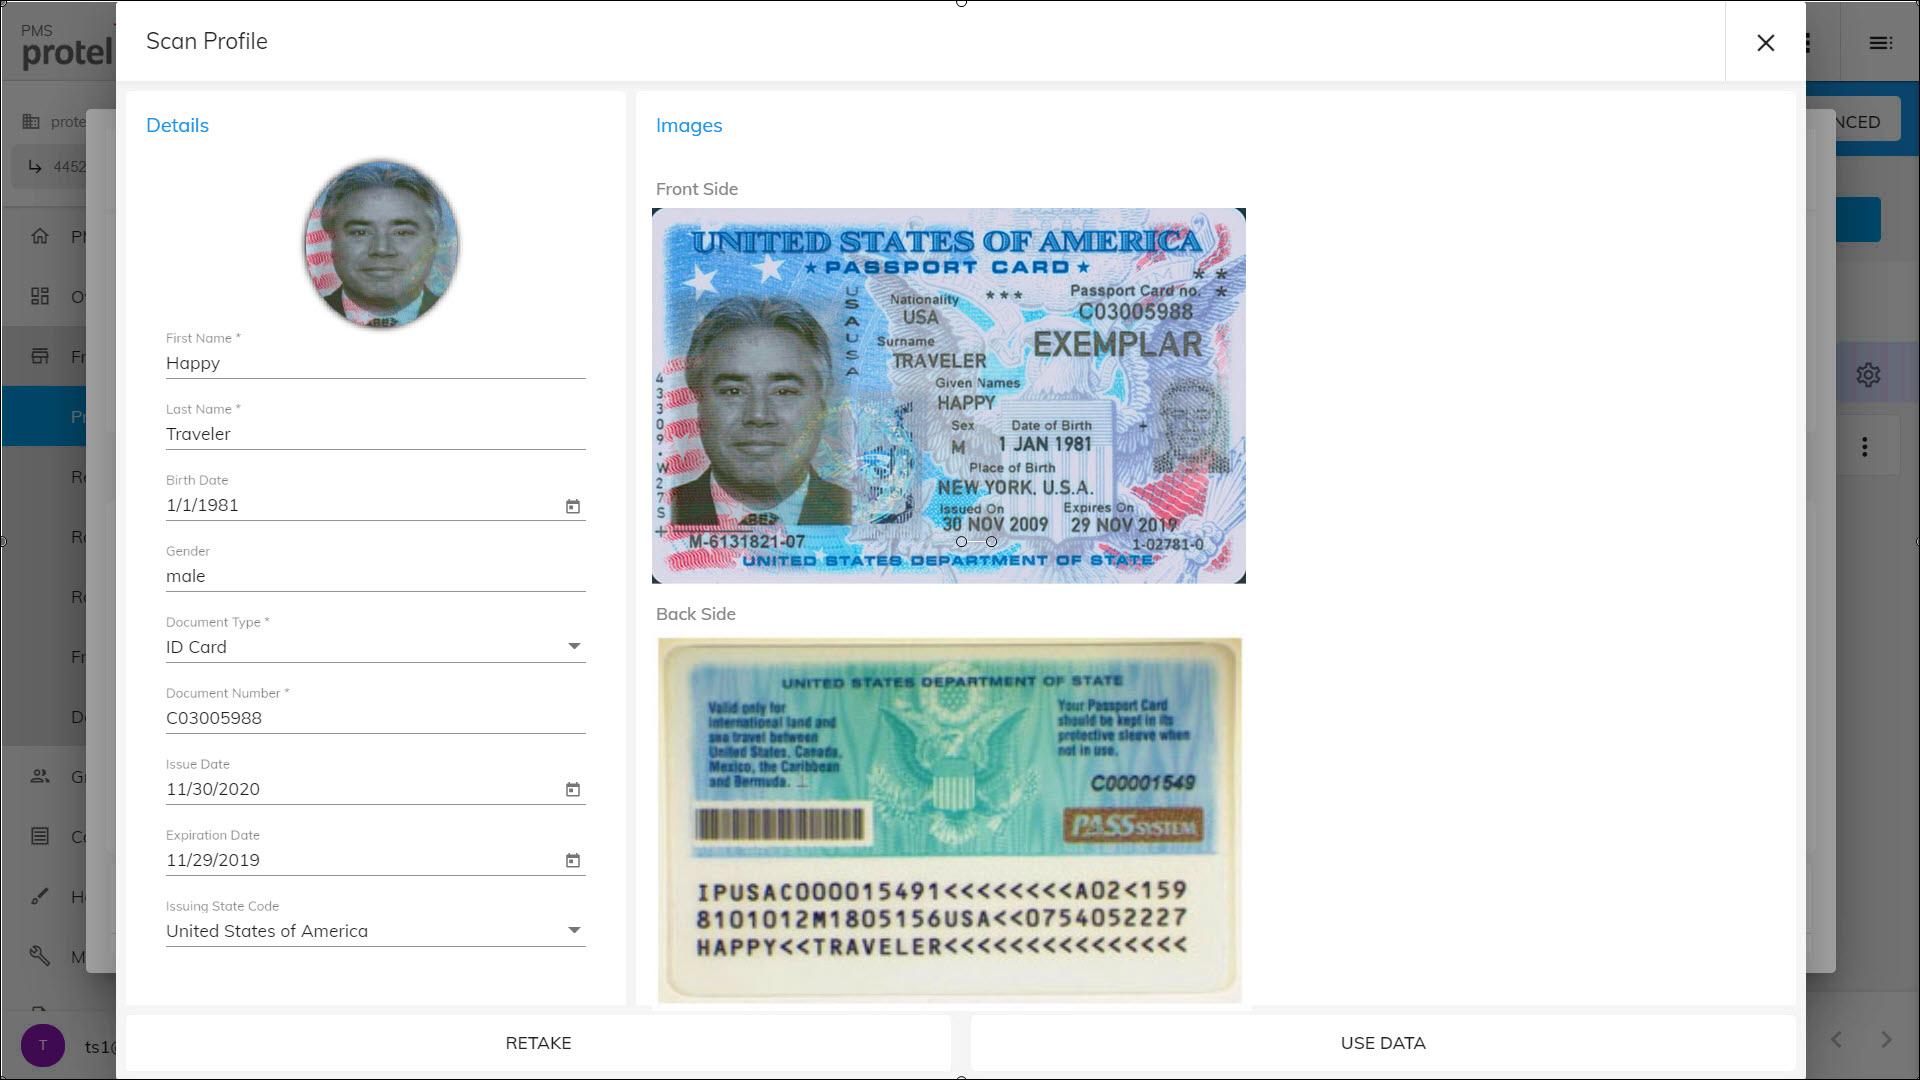 protel Air passport scan